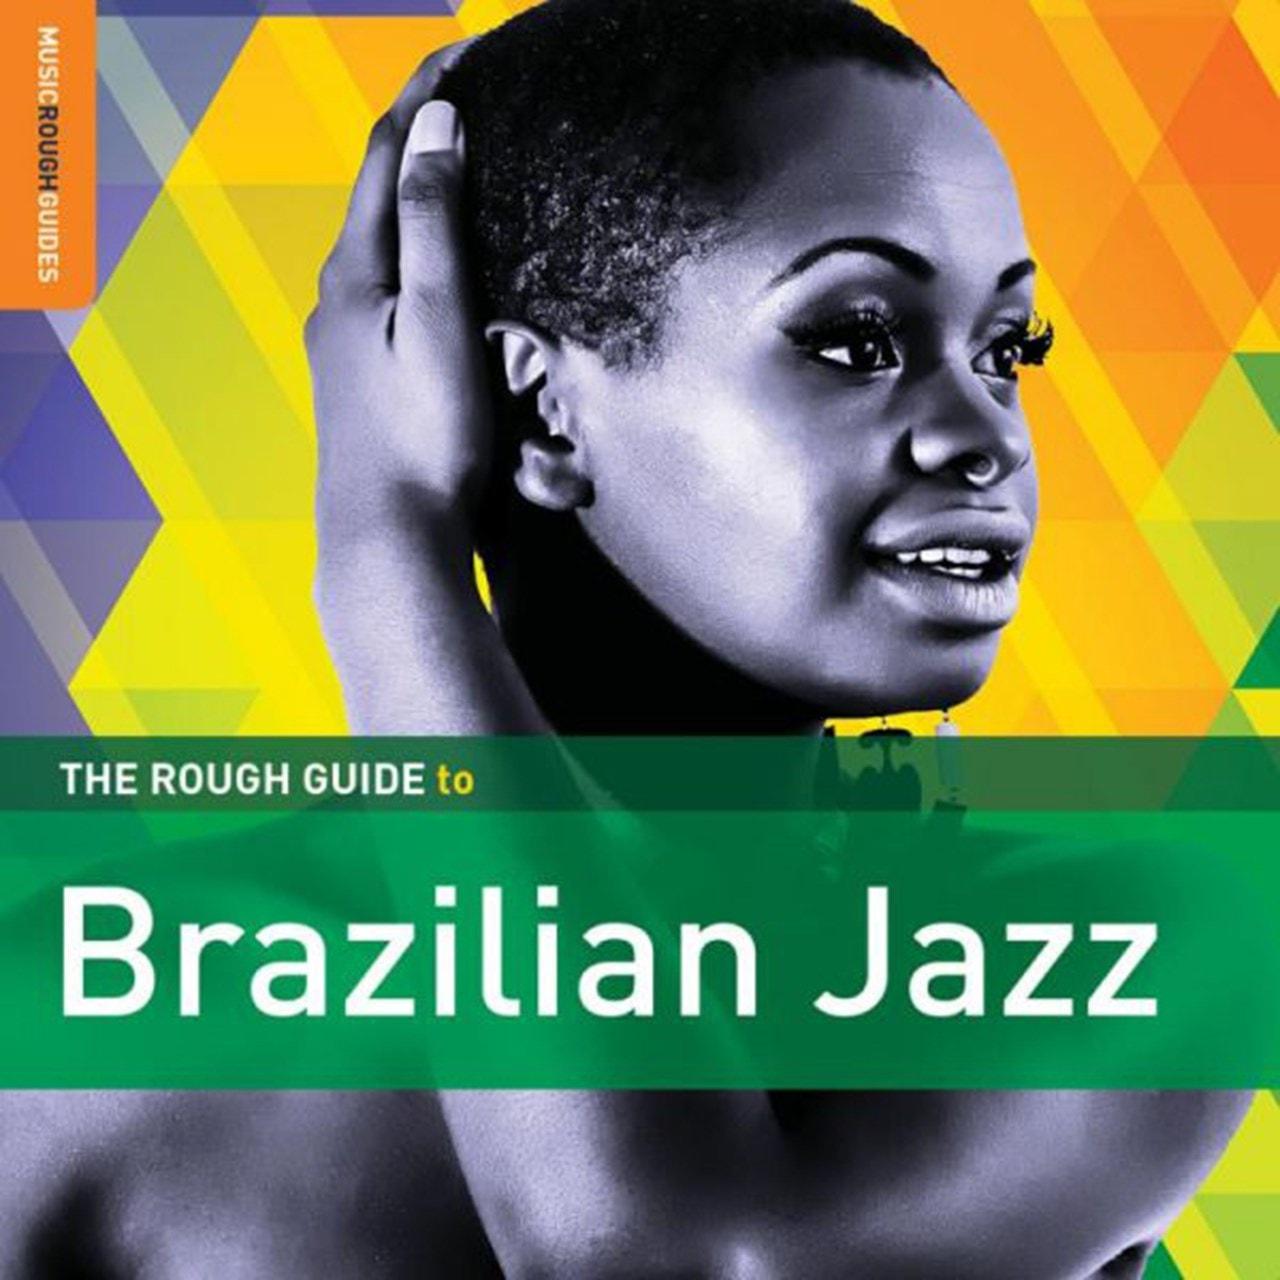 The Rough Guide to Brazilian Jazz - 1